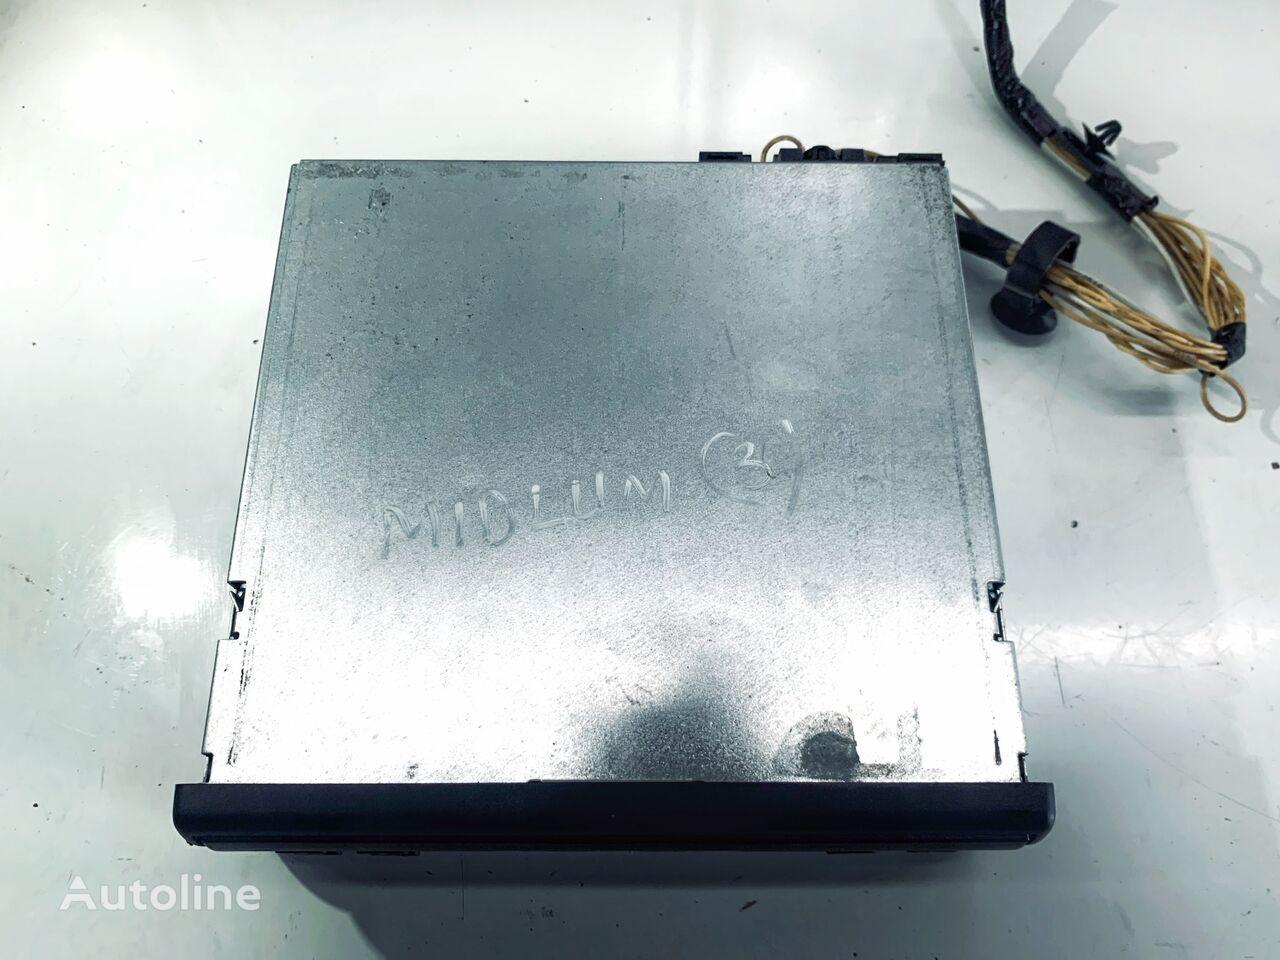 RENAULT (5010577277) tacógrafo para RENAULT MIDLUM tractora